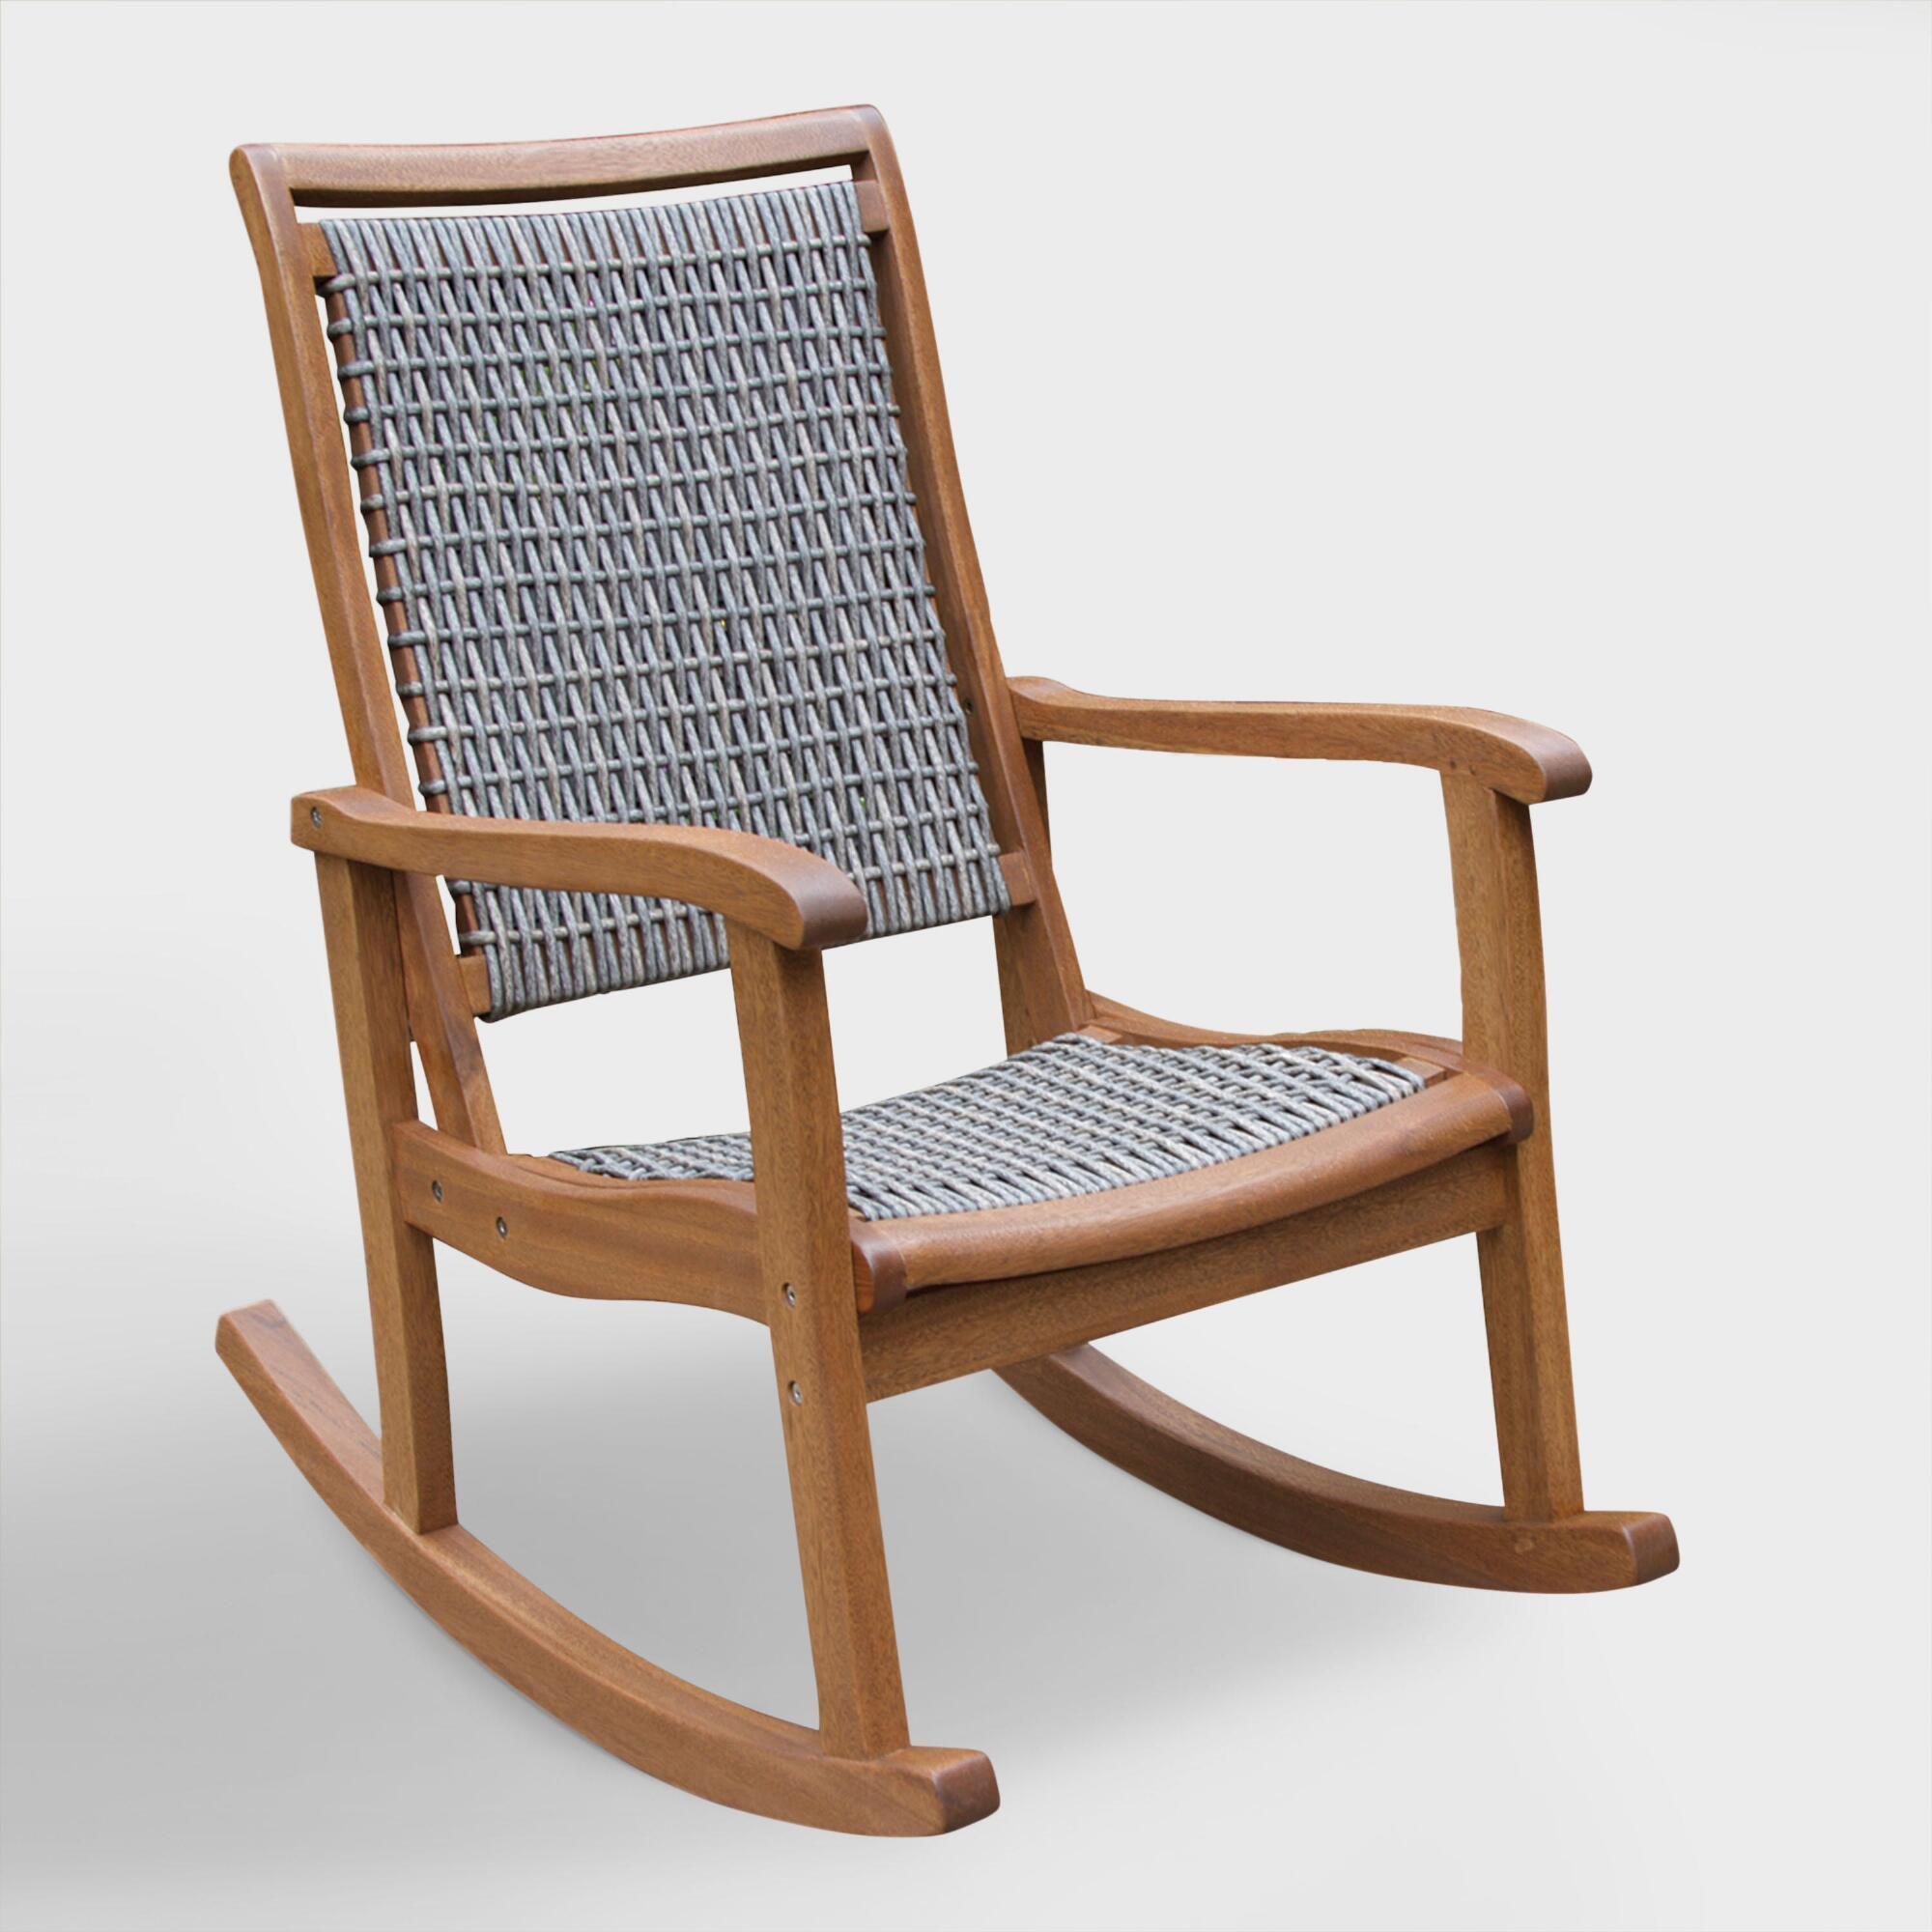 6 Wicker U0026 Wood All Weather Rocking Chair